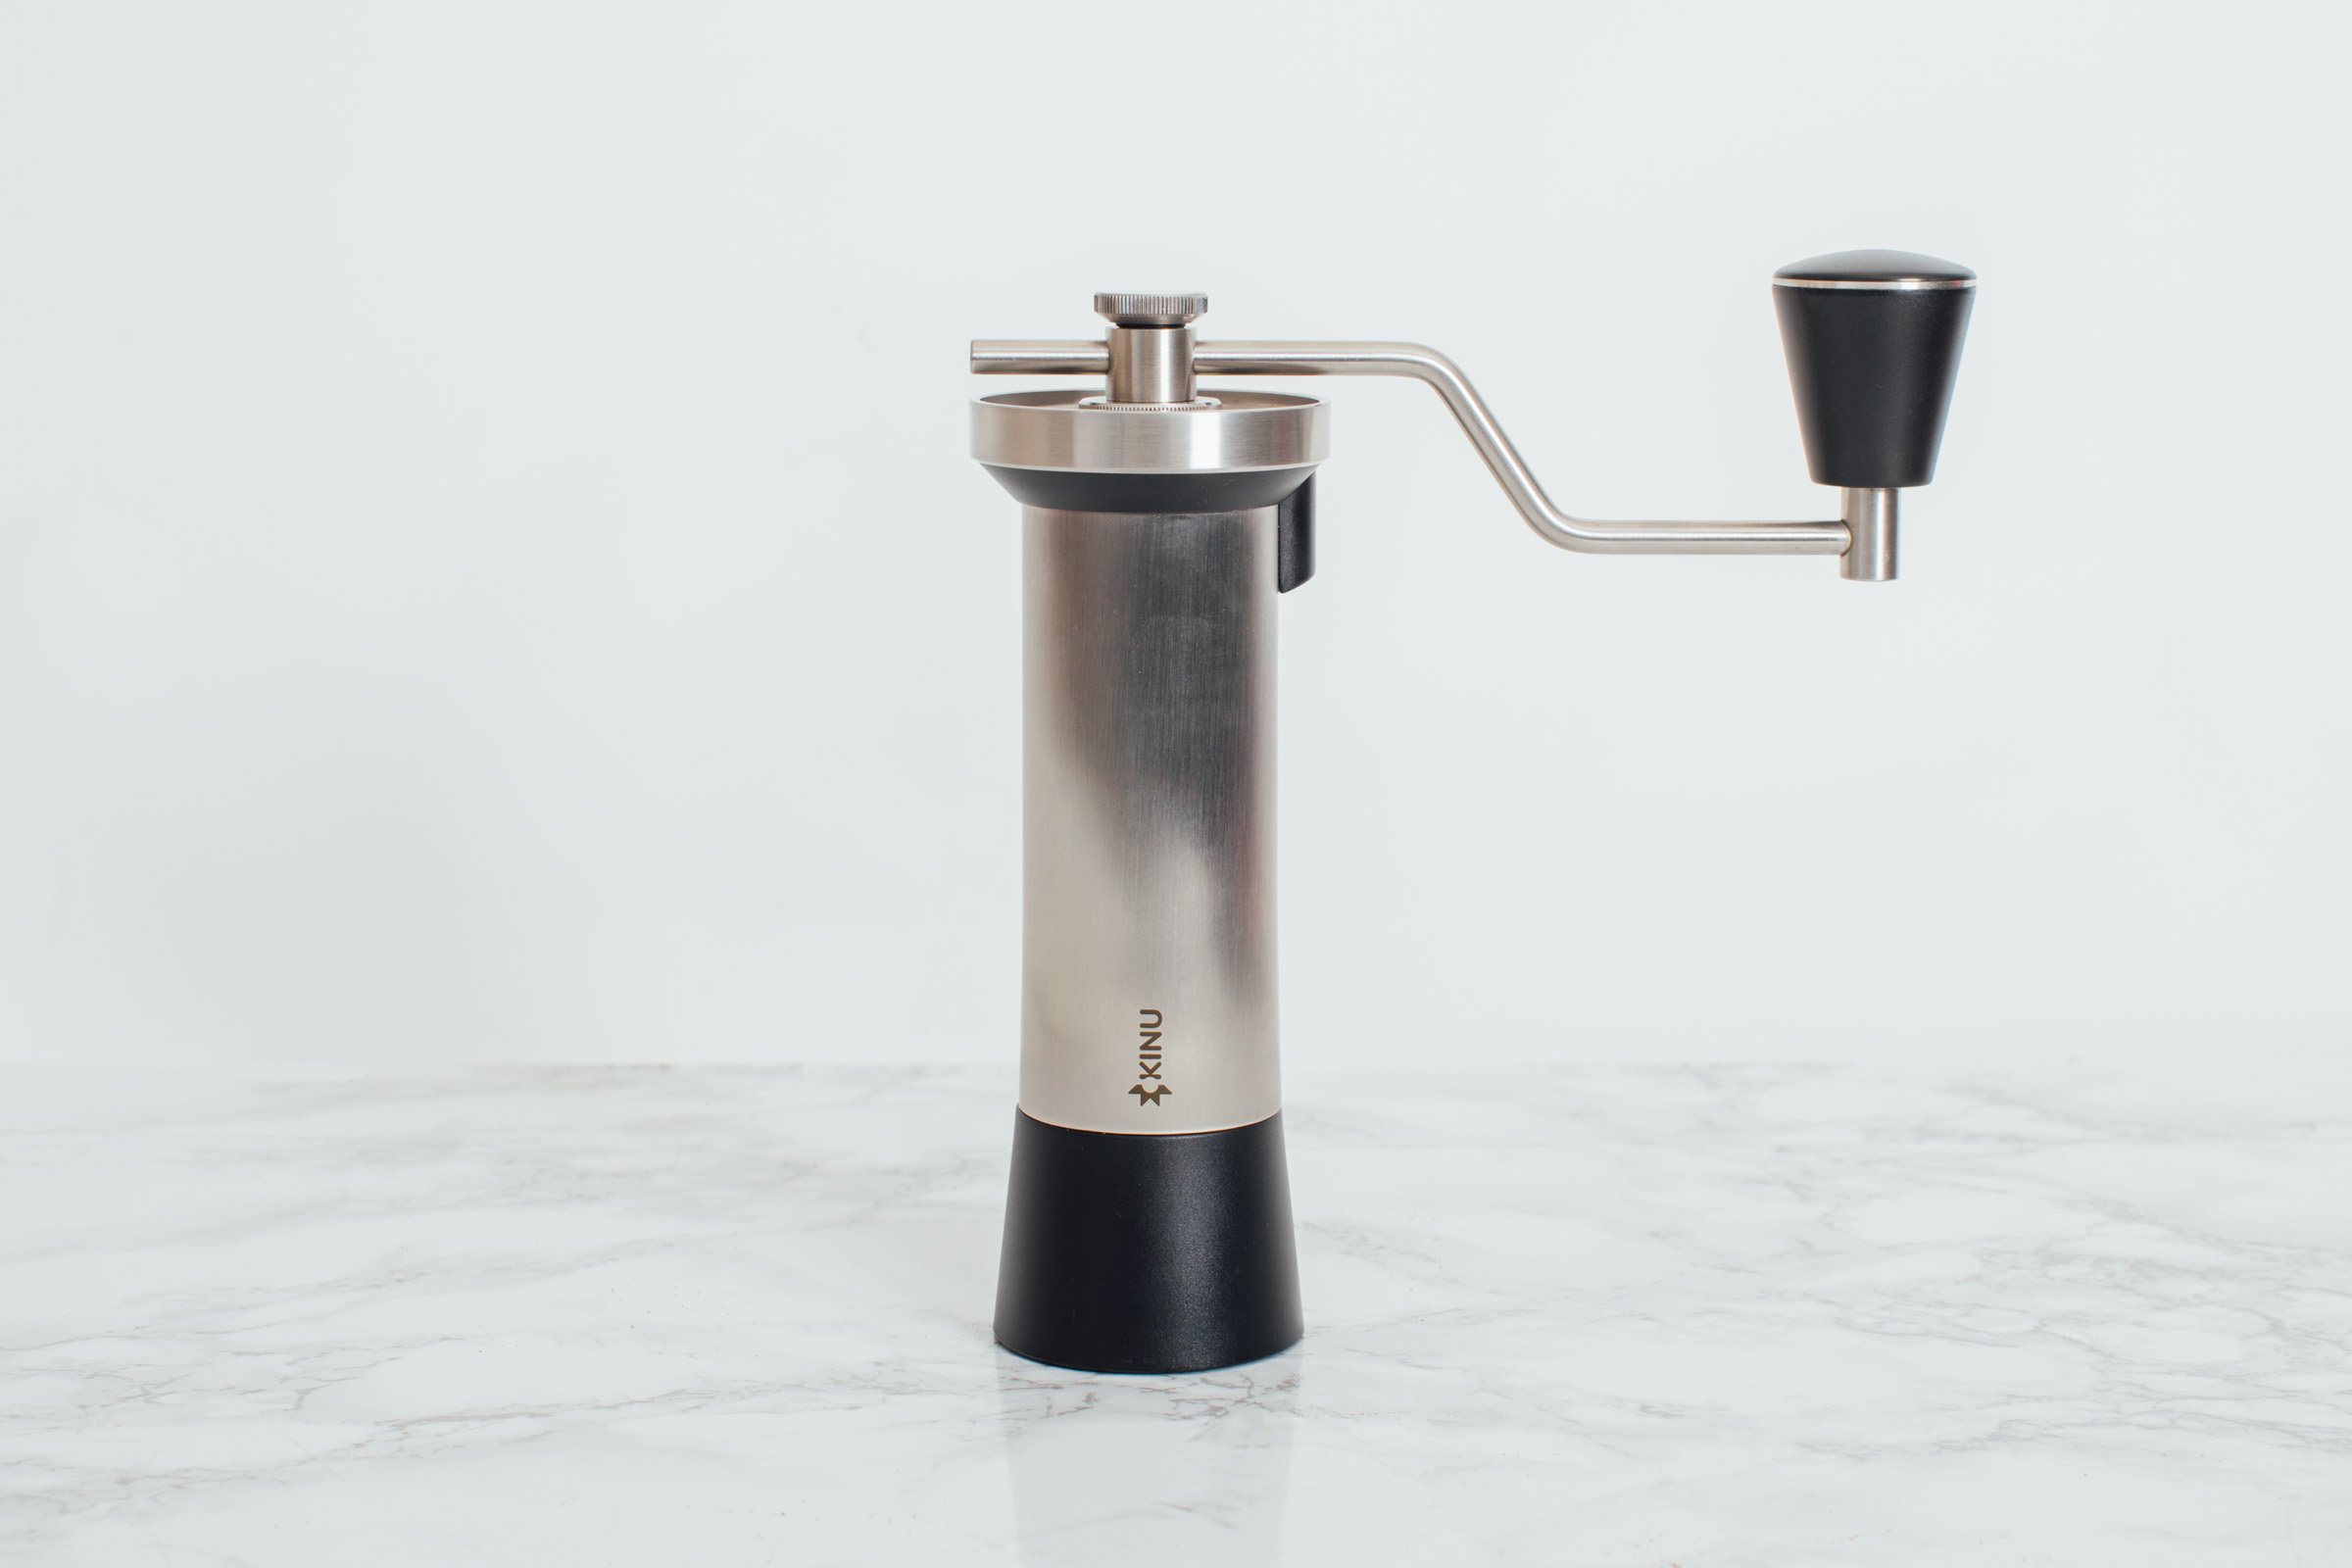 Feld2 hand grinder